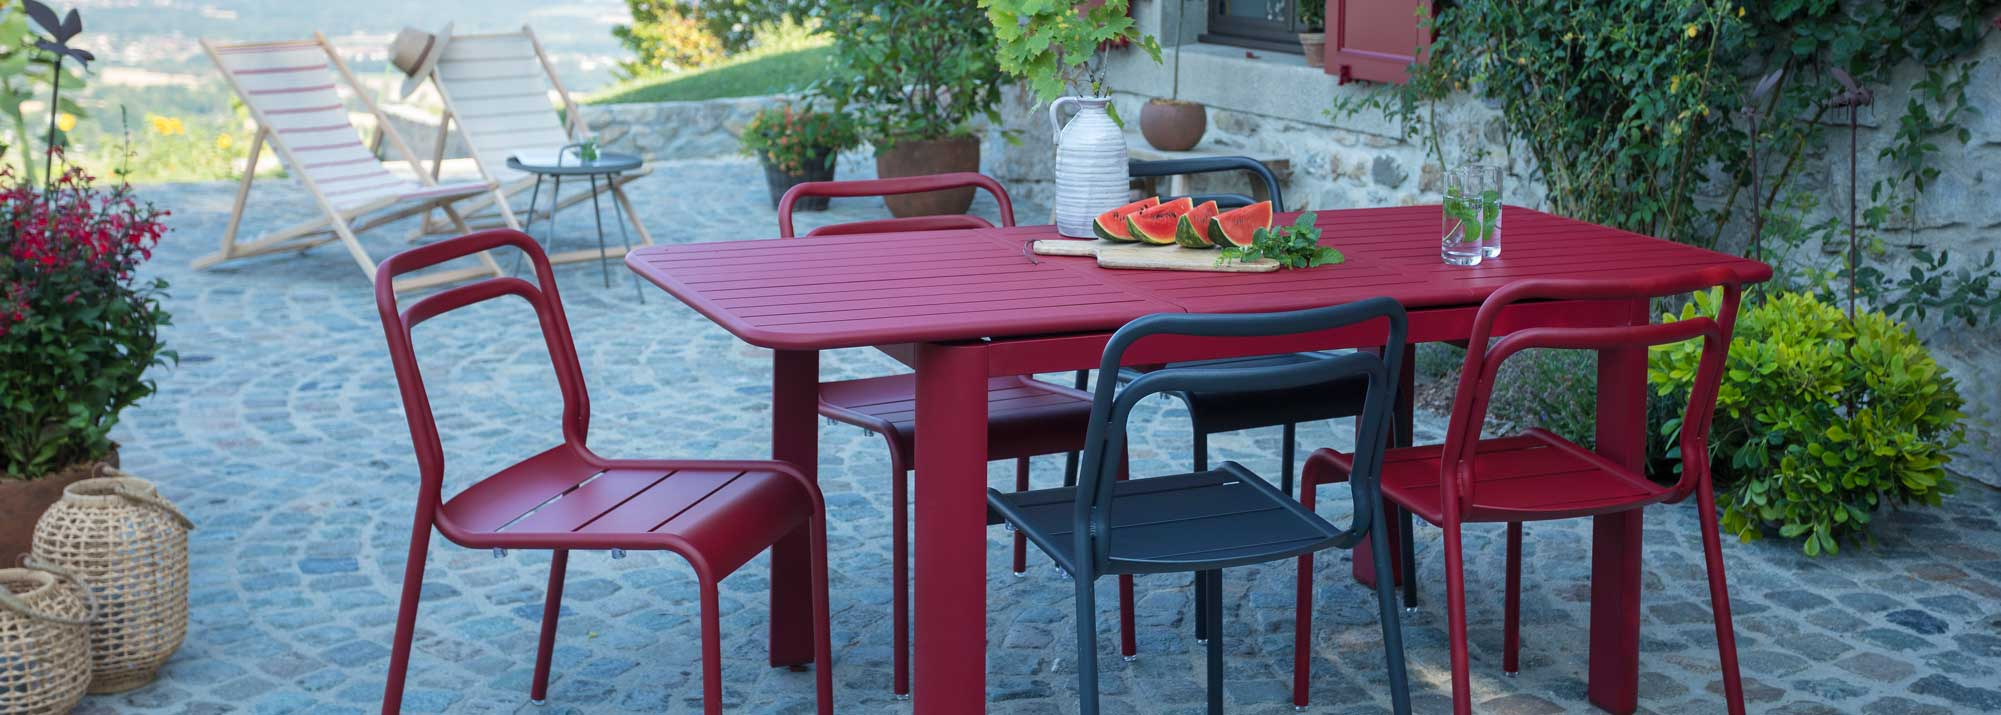 Table De Jardin : Botanic®, Tables De Jardin En Aluminium ... dedans Botanic Salon De Jardin